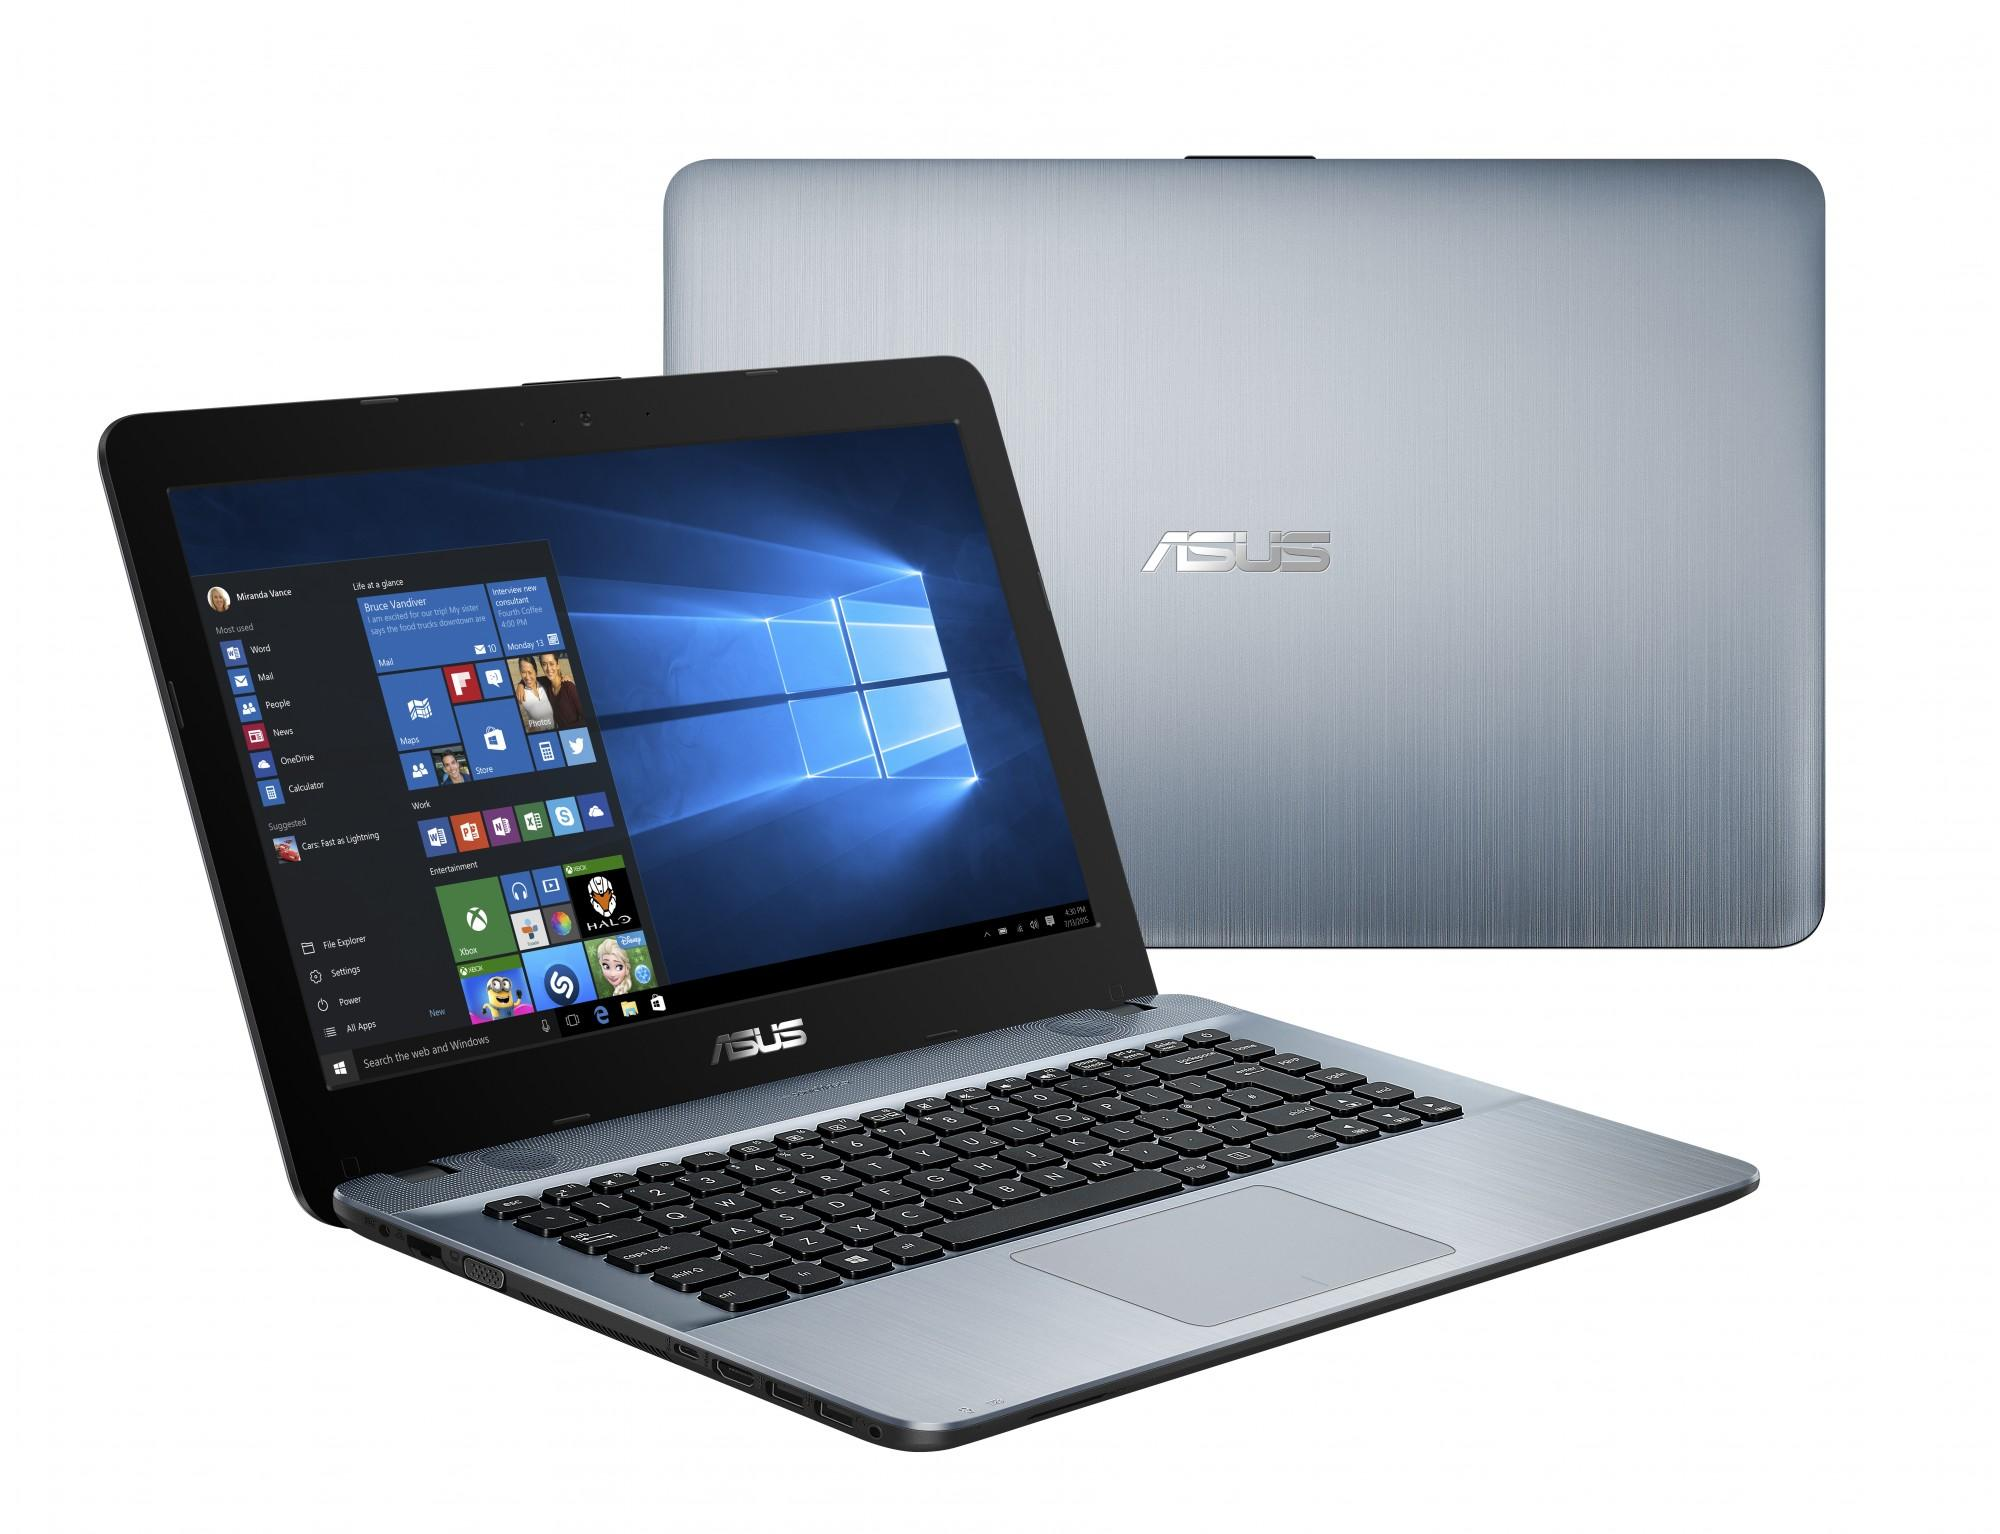 Harga Asus Notebook Laptop A456ur Core I5 7200u New Processor Acer Aspire E5 475g 541u Gr Intel Kabylake A442ur 1tb 4gb Vga Gt 2gb Win